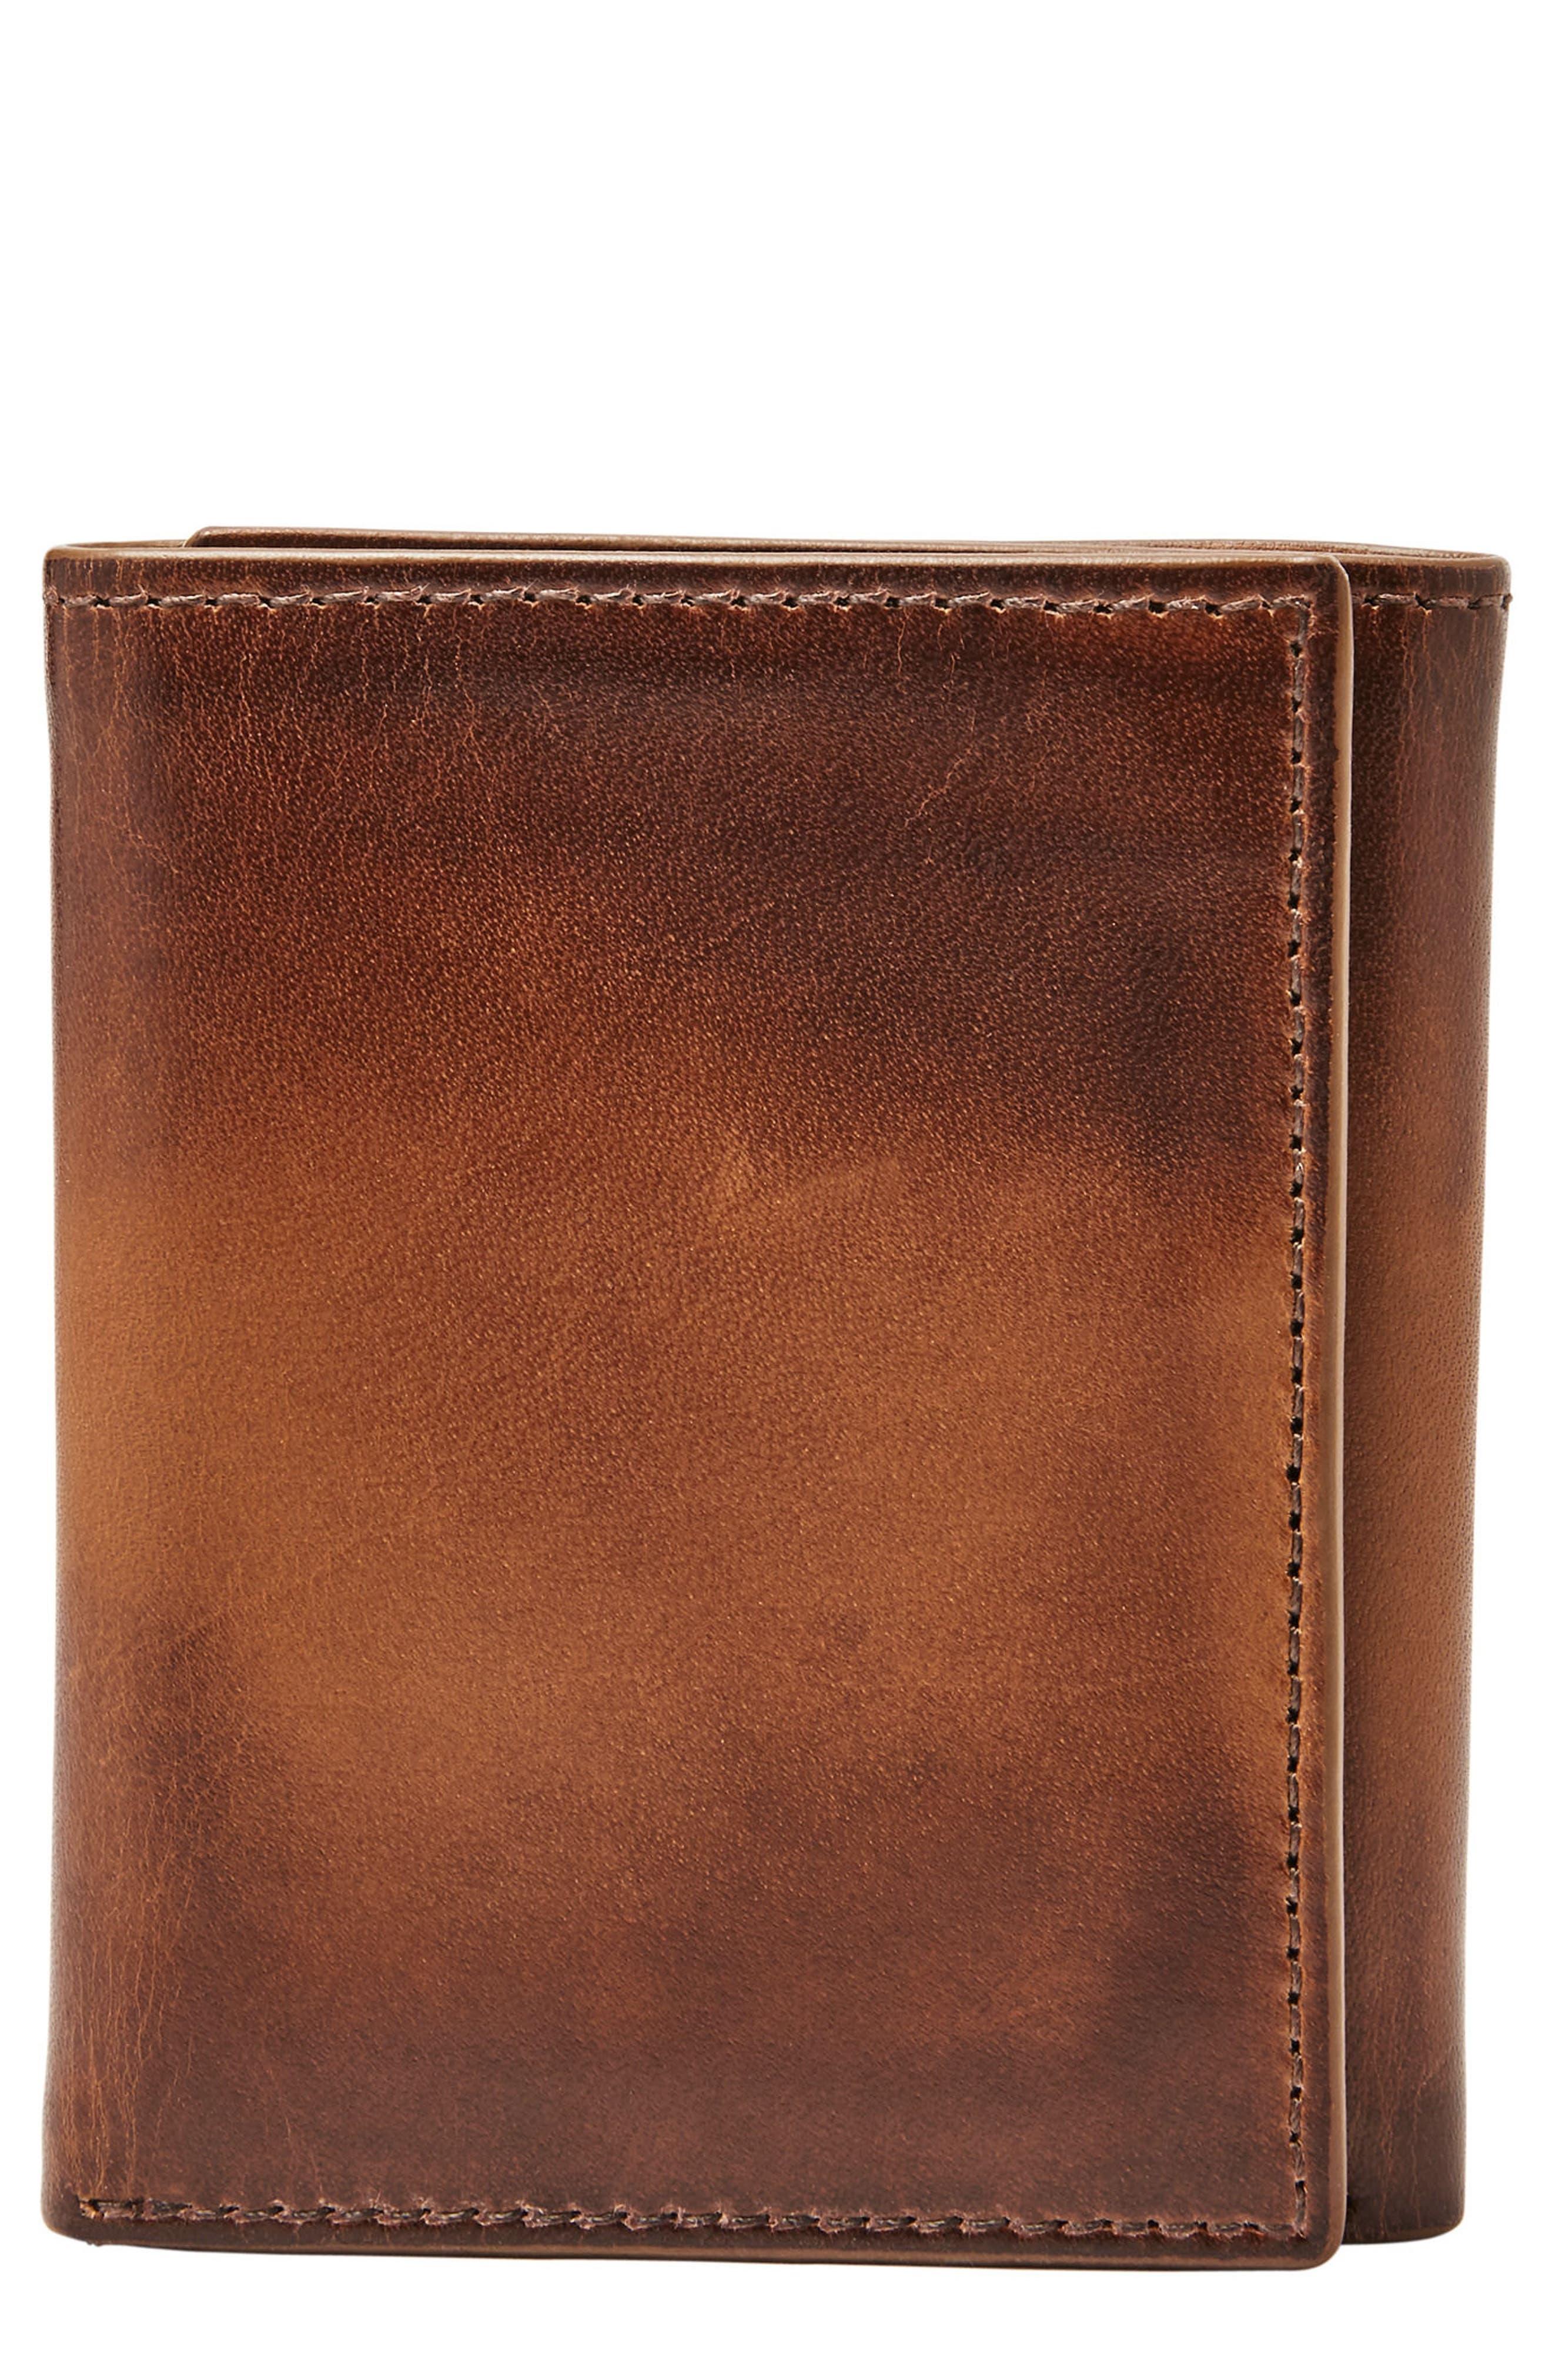 Paul Leather Wallet,                         Main,                         color, 222